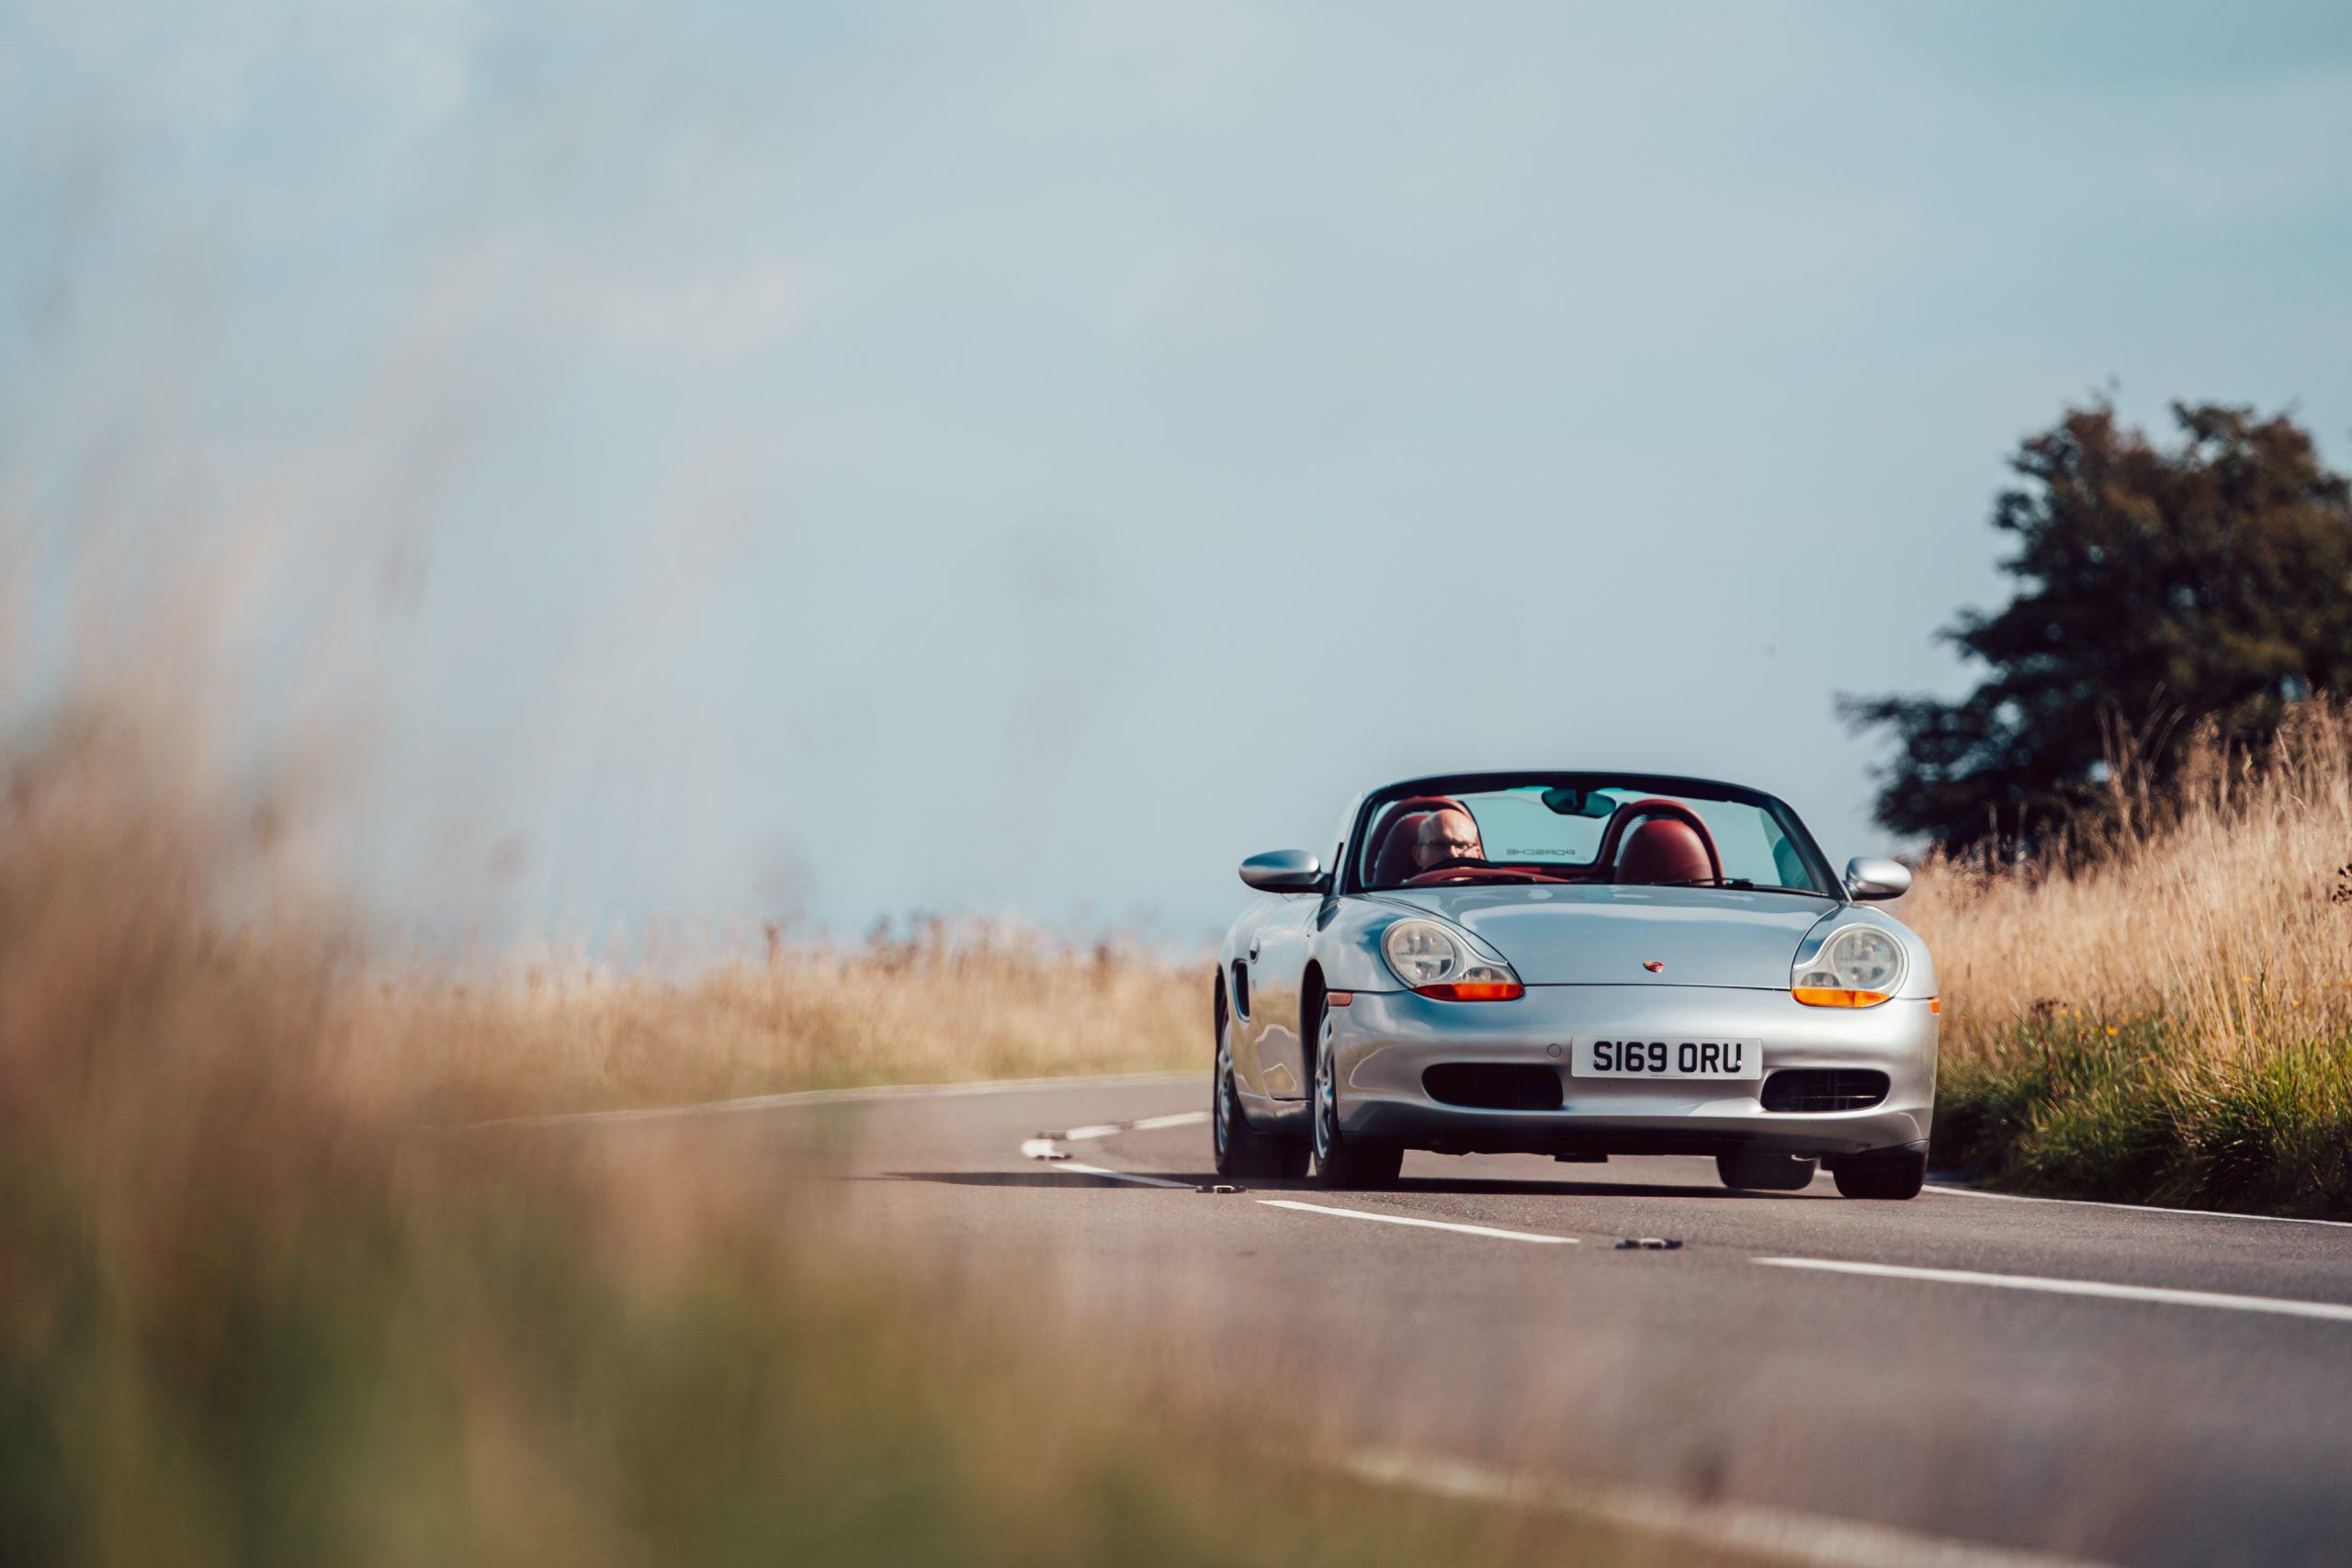 1998 Porsche Boxster 986 front driving action